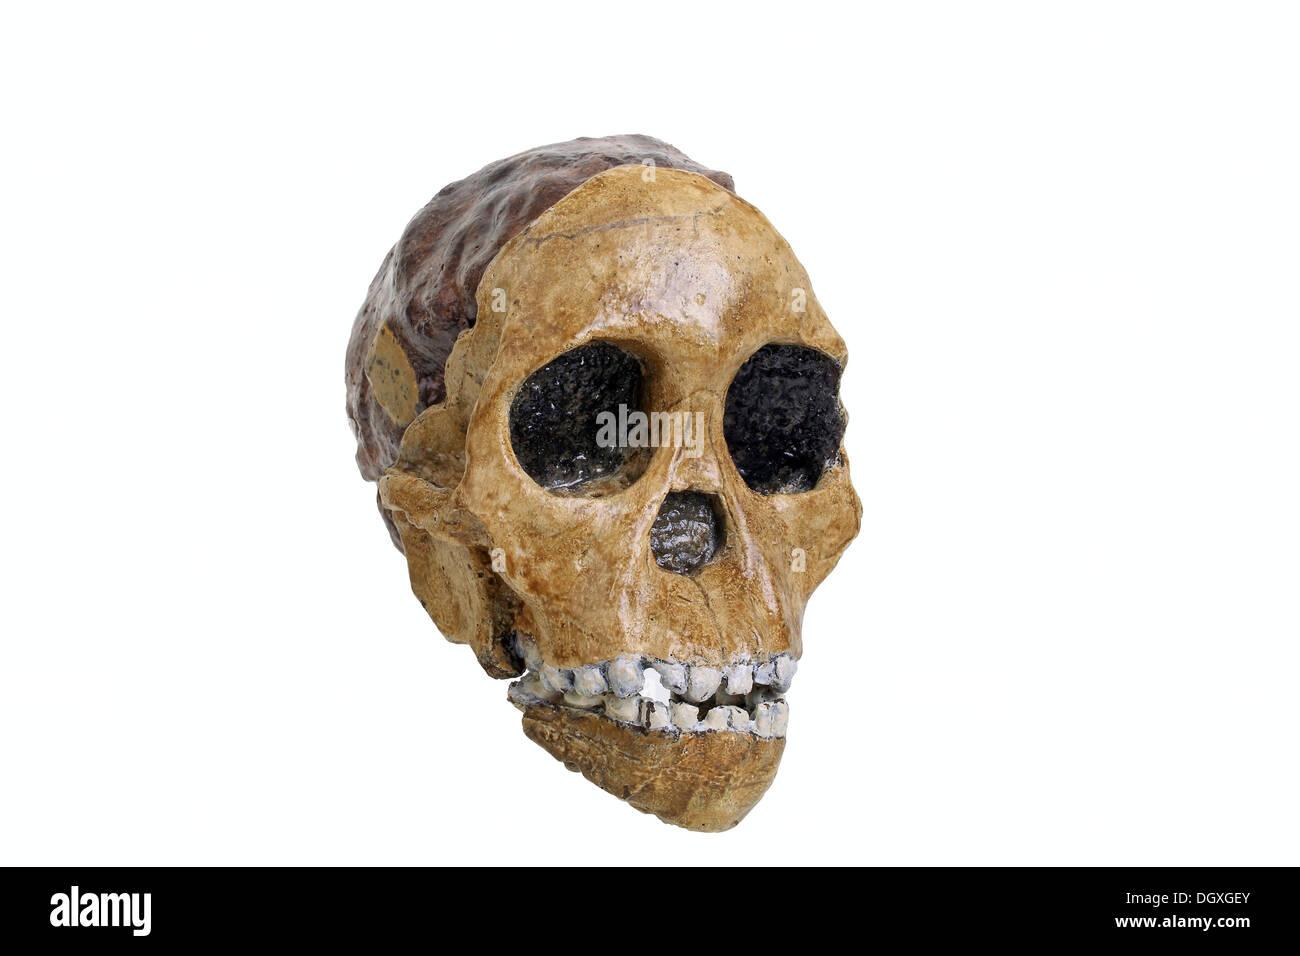 Baby Skull Stockfotos & Baby Skull Bilder - Alamy